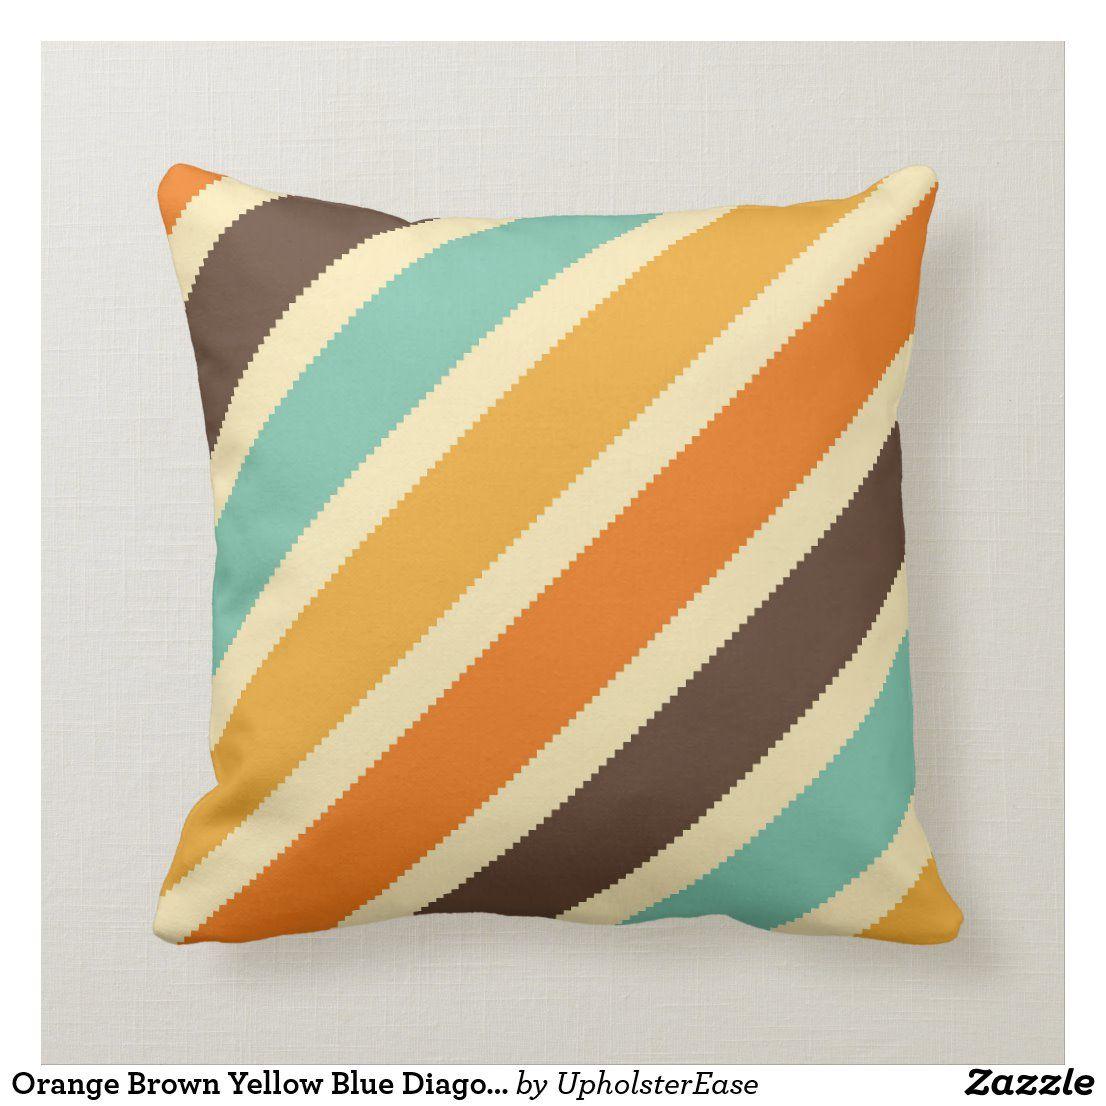 Orange Brown Yellow Blue Diagonal Stripe Pillow